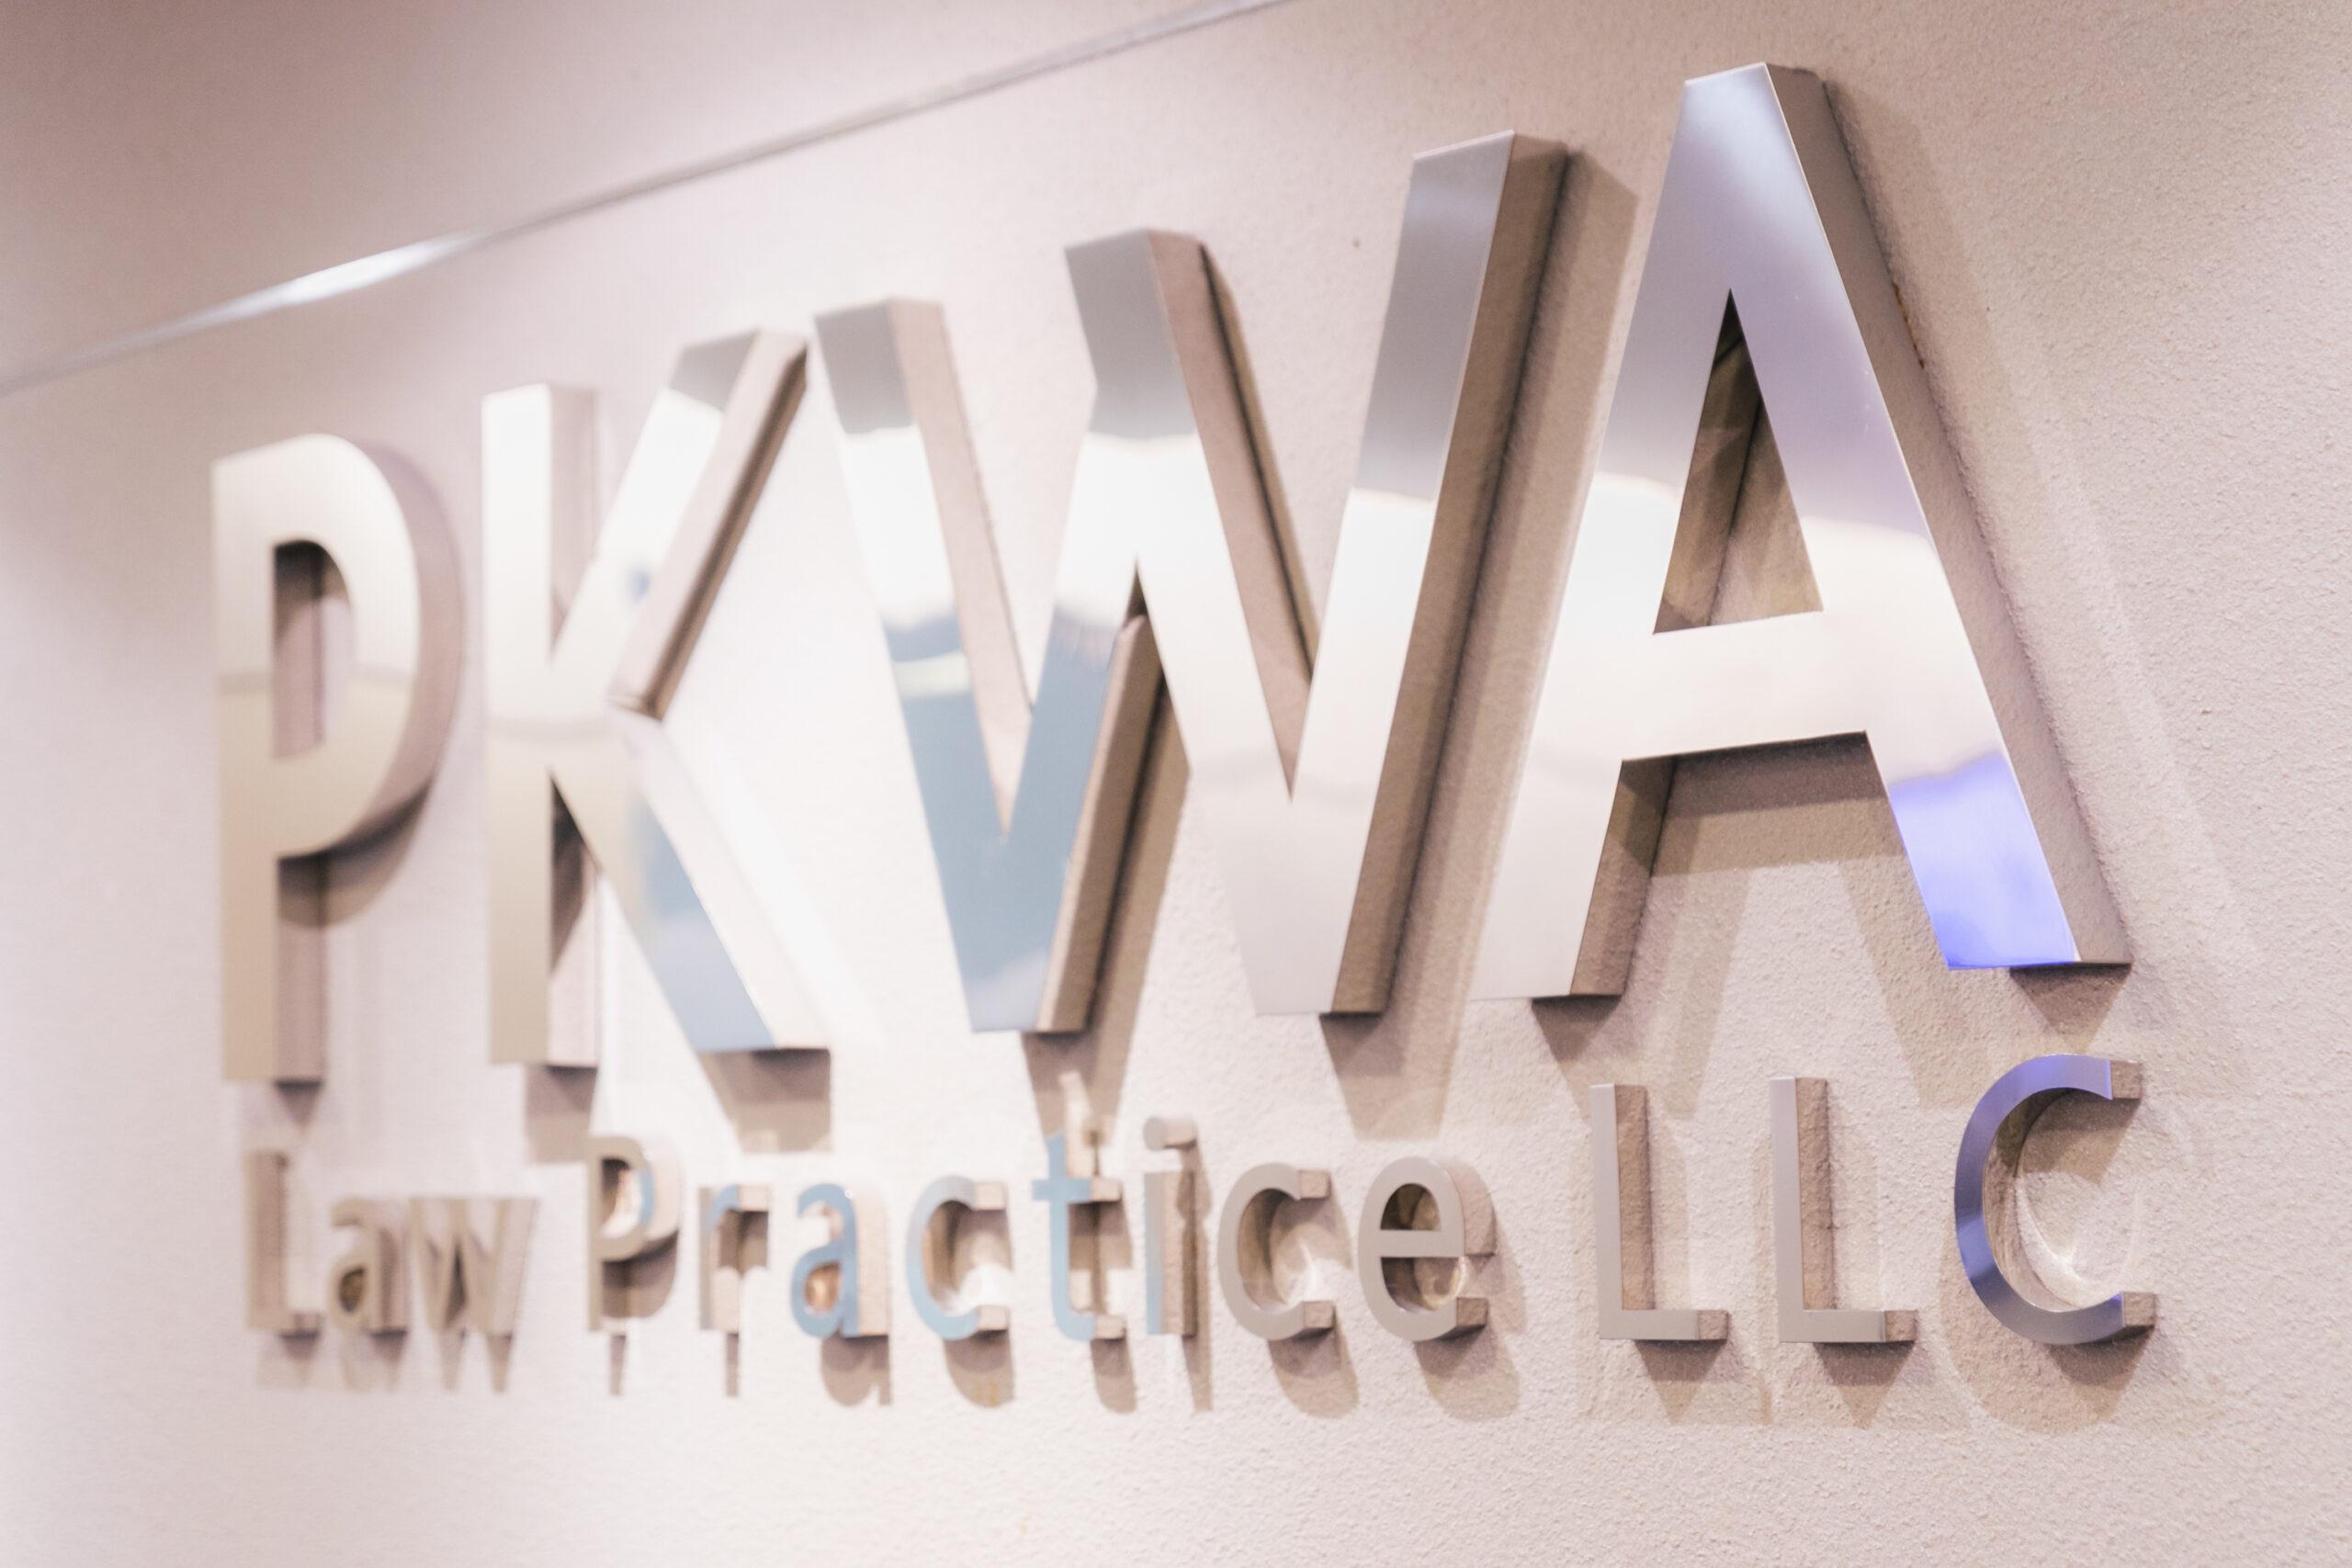 Free Divorce Lawyer Consultation